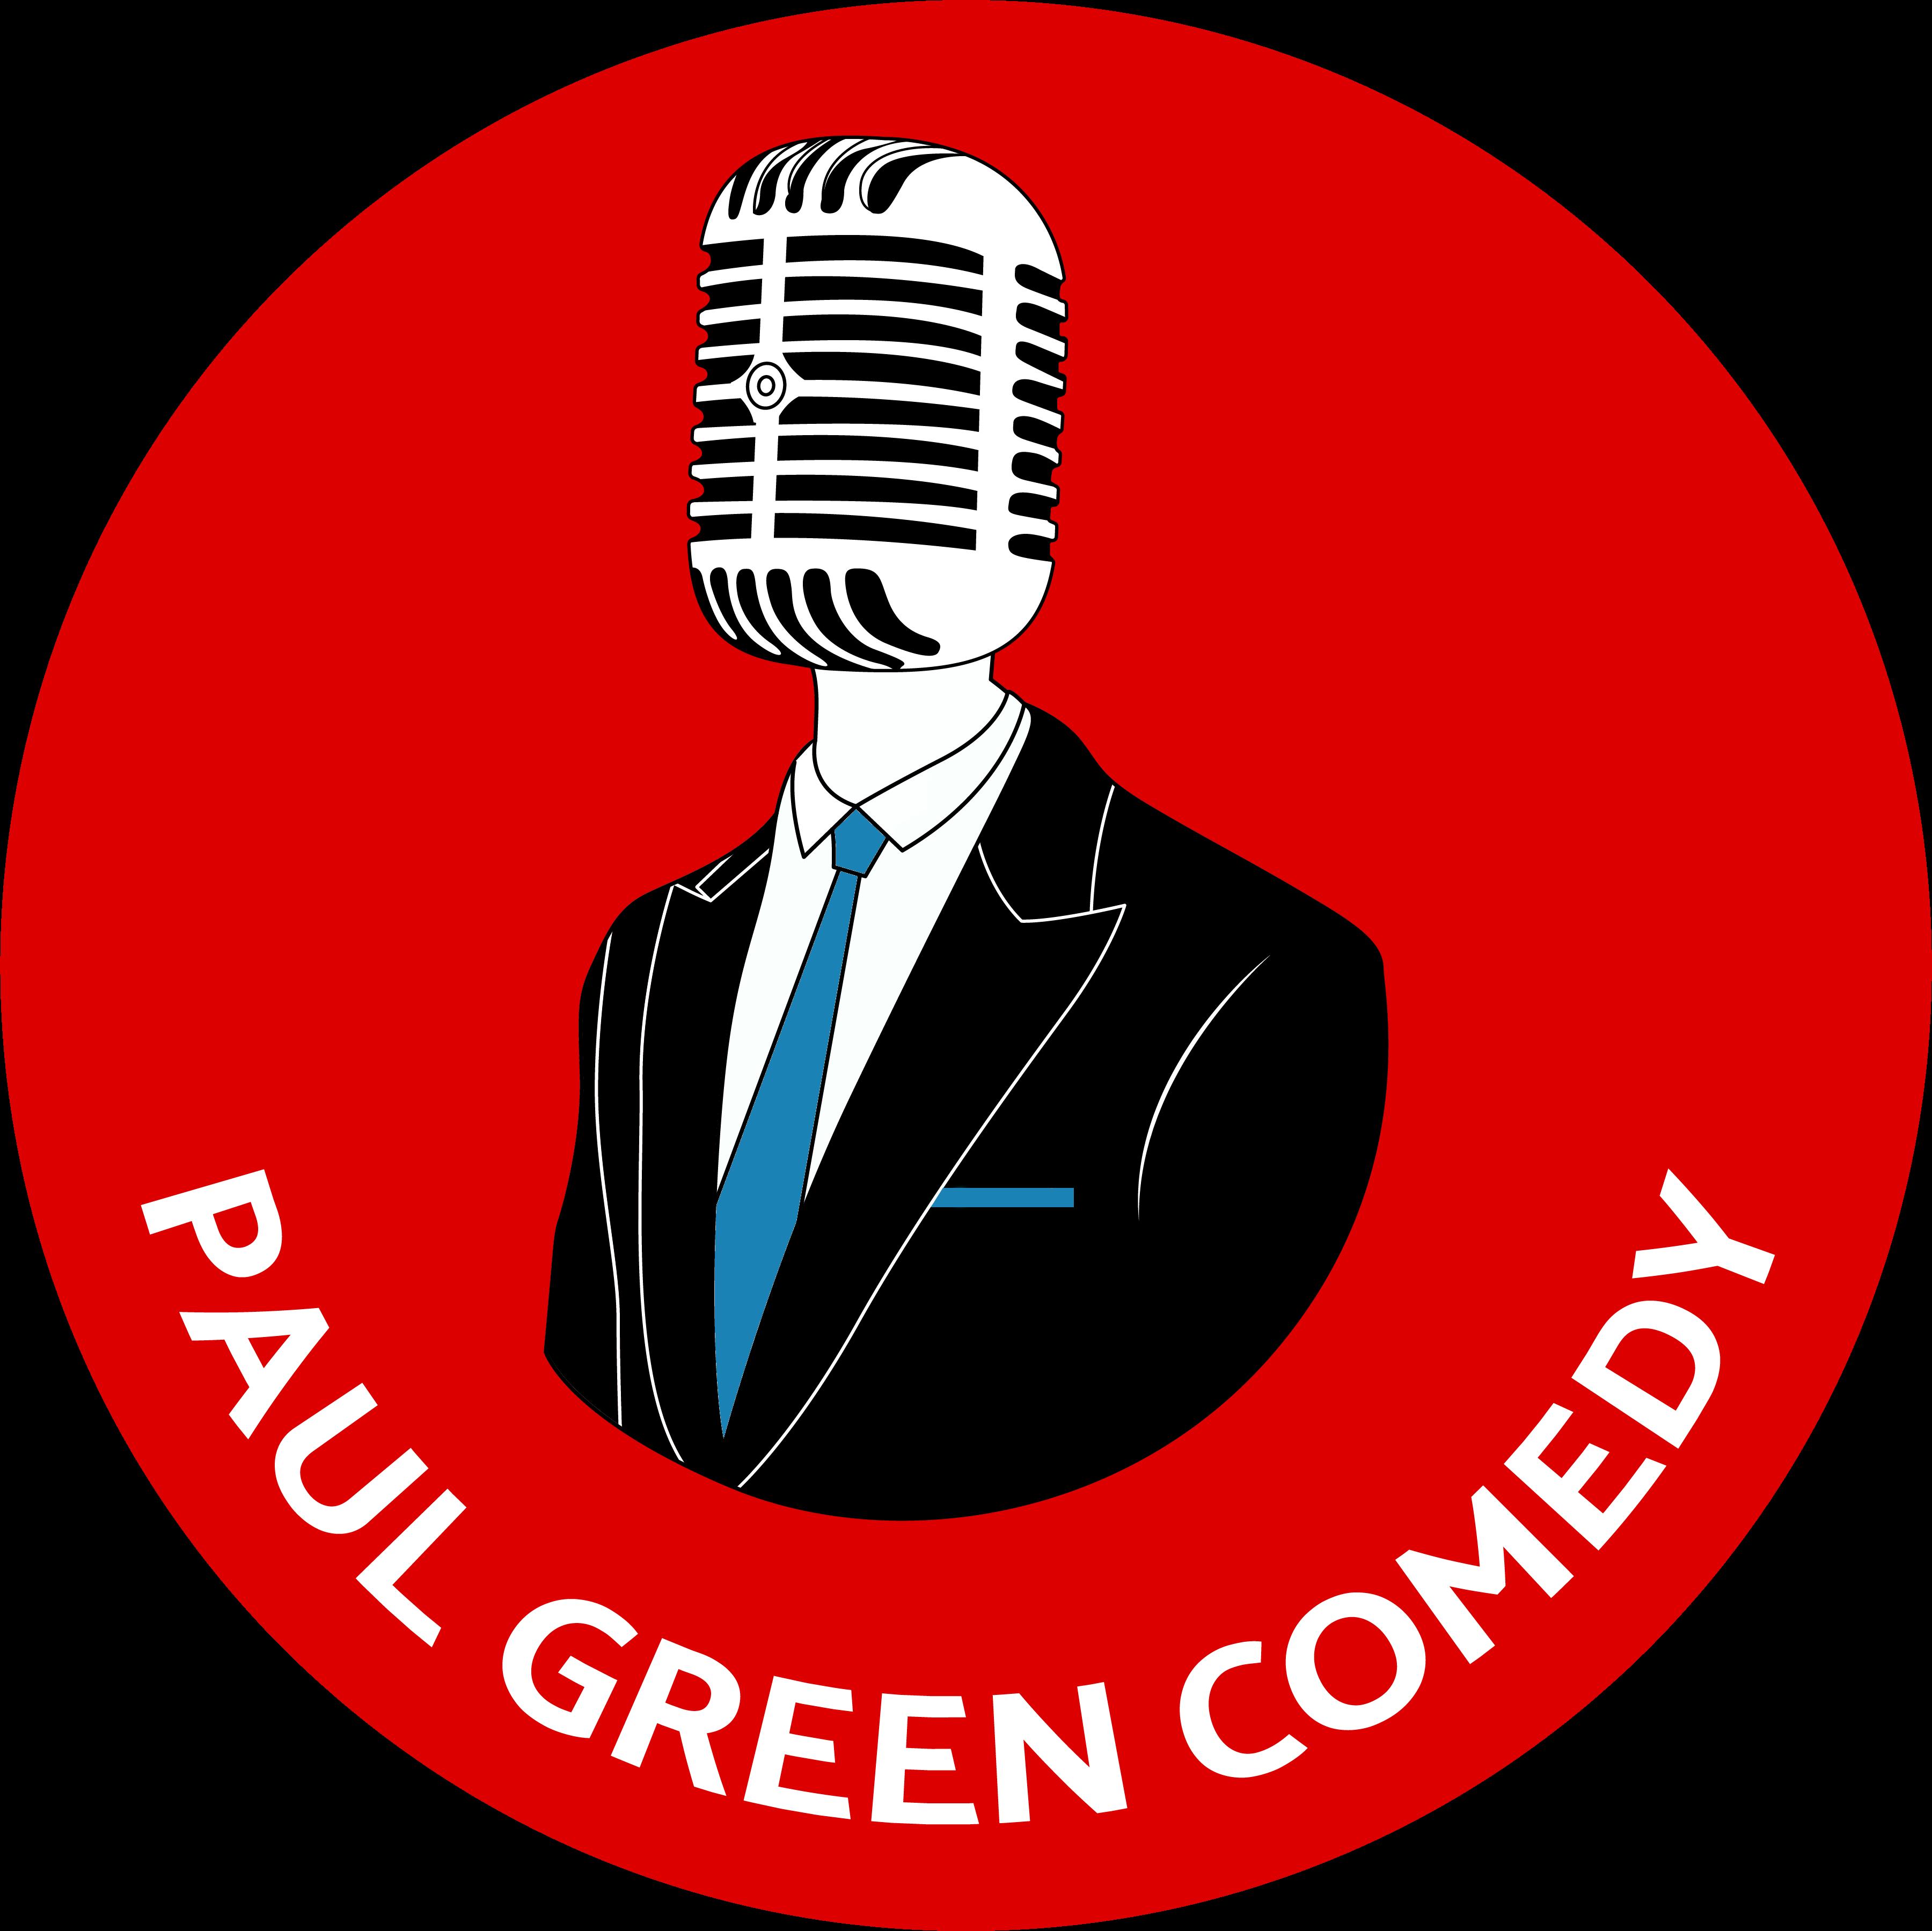 Paul Green Comedy